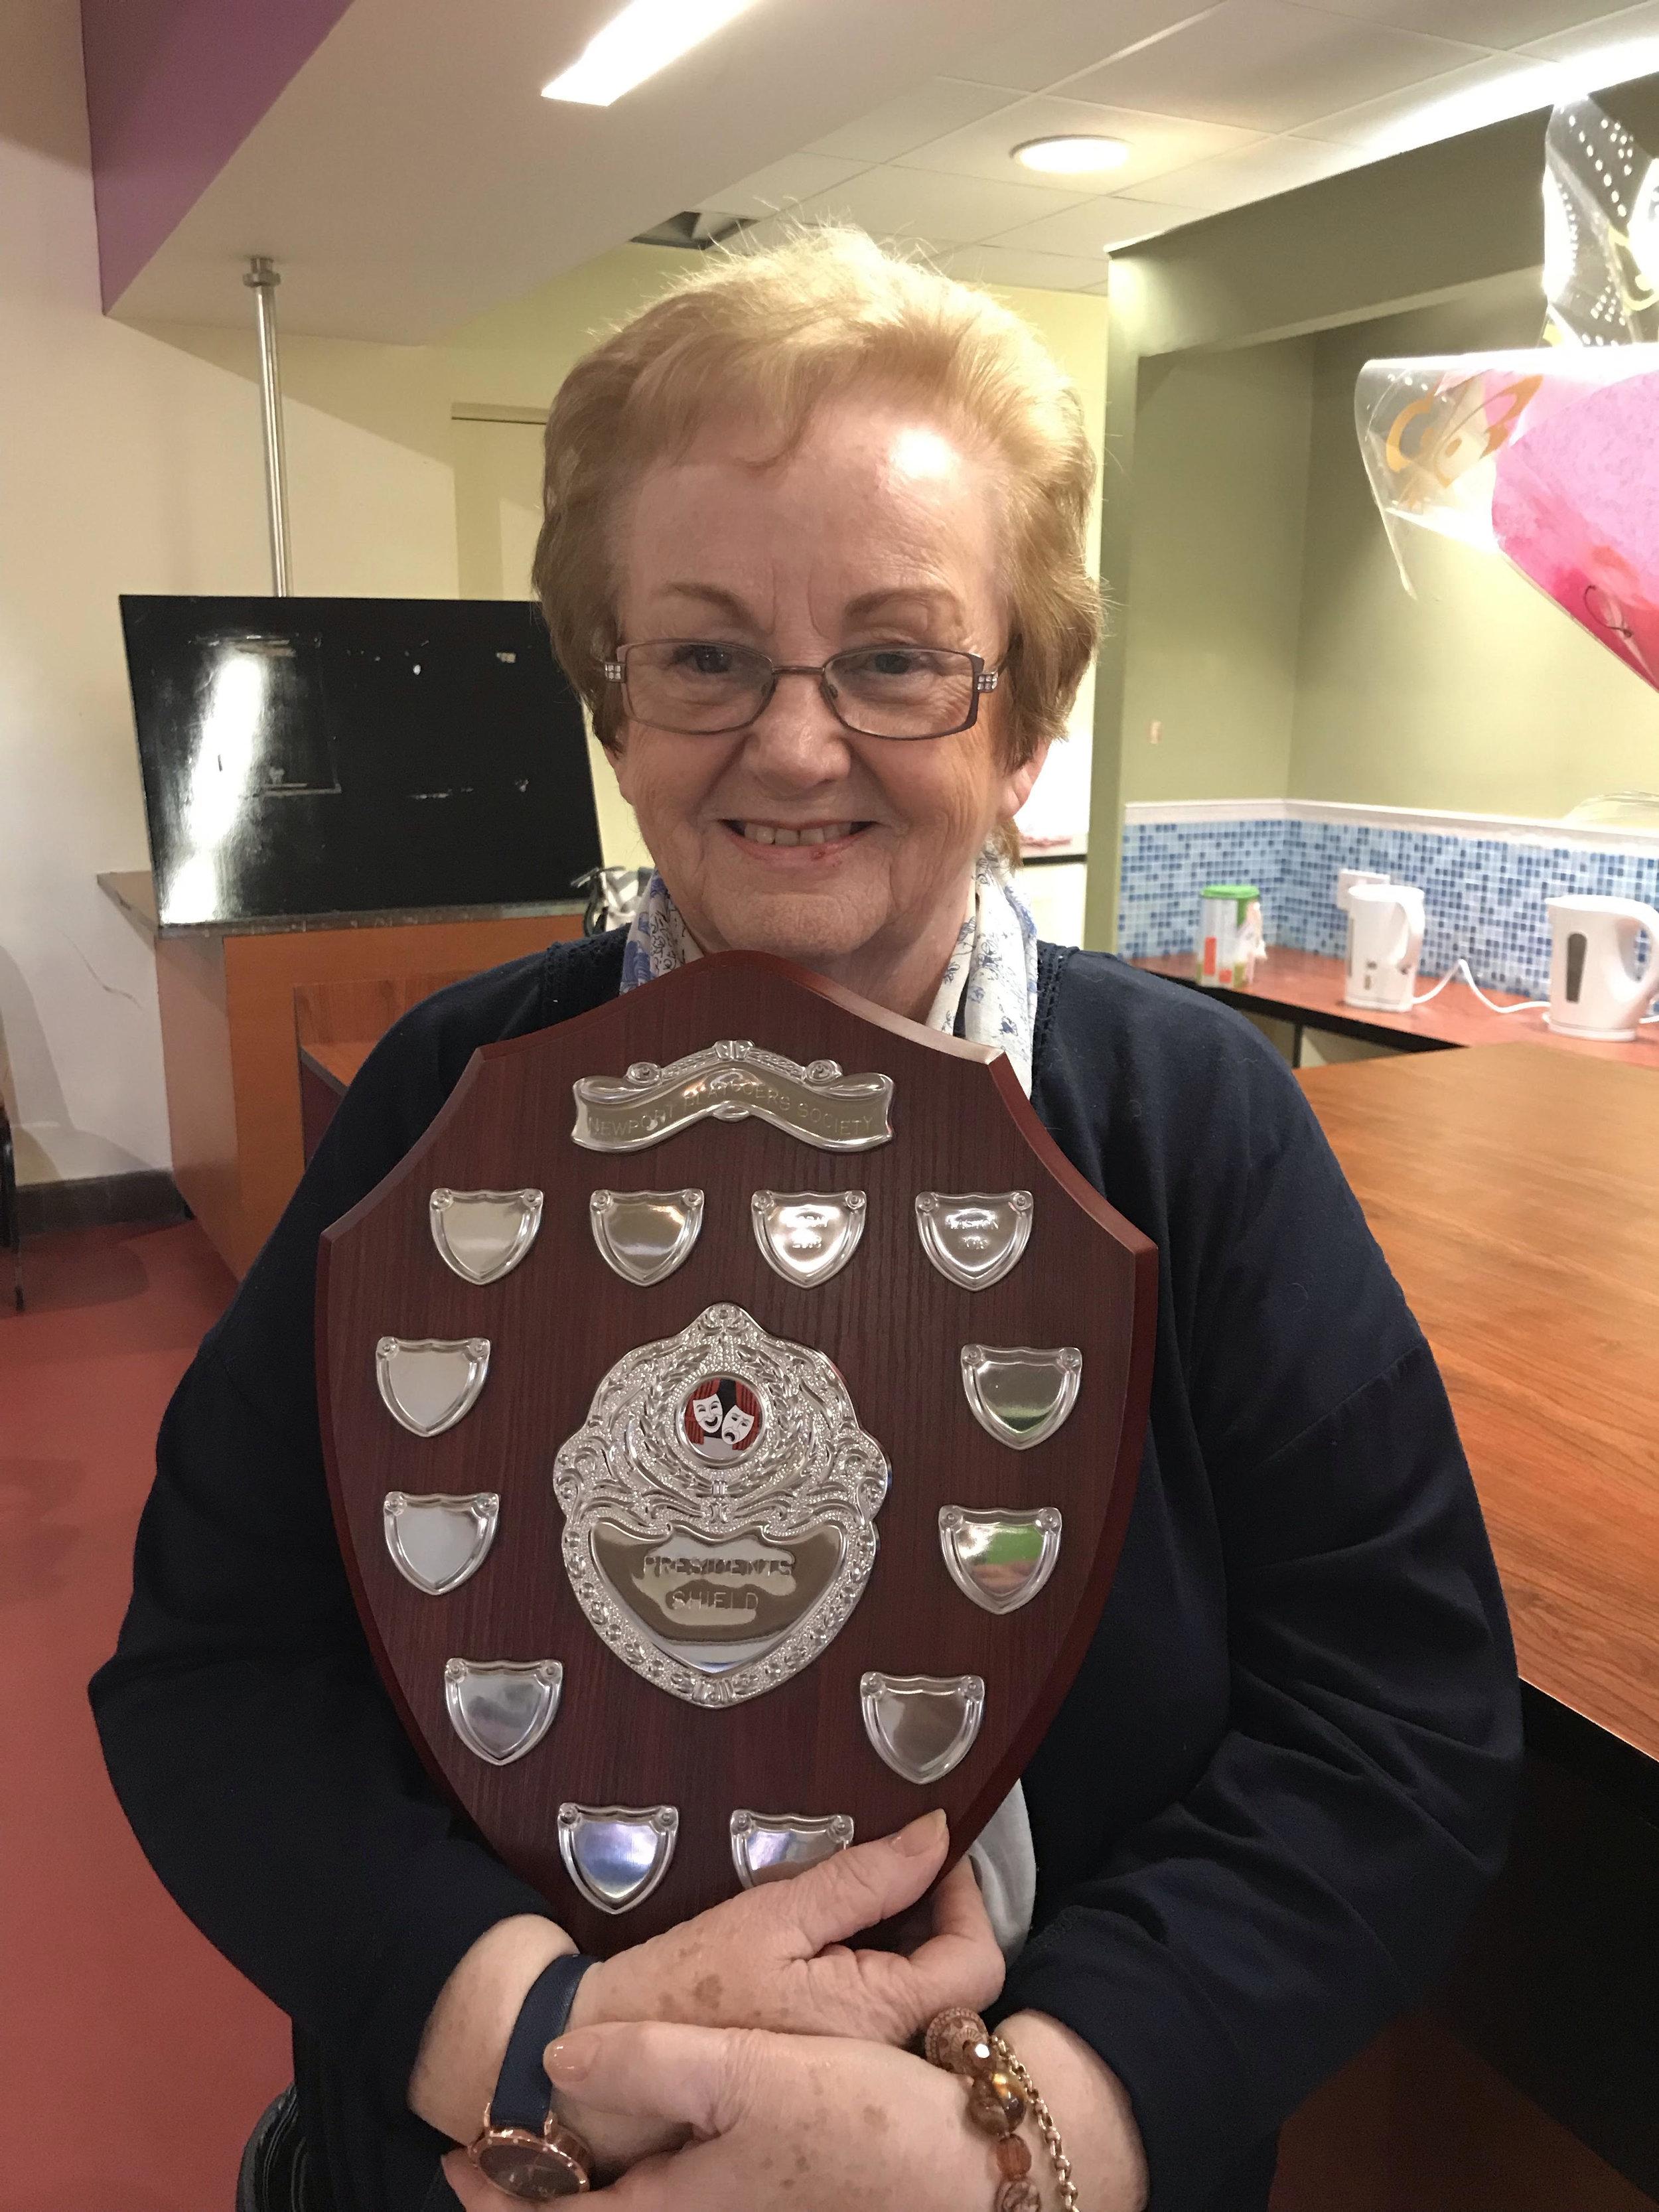 Audrey Aston with the Presidents Award . Photo: Clare Drewett